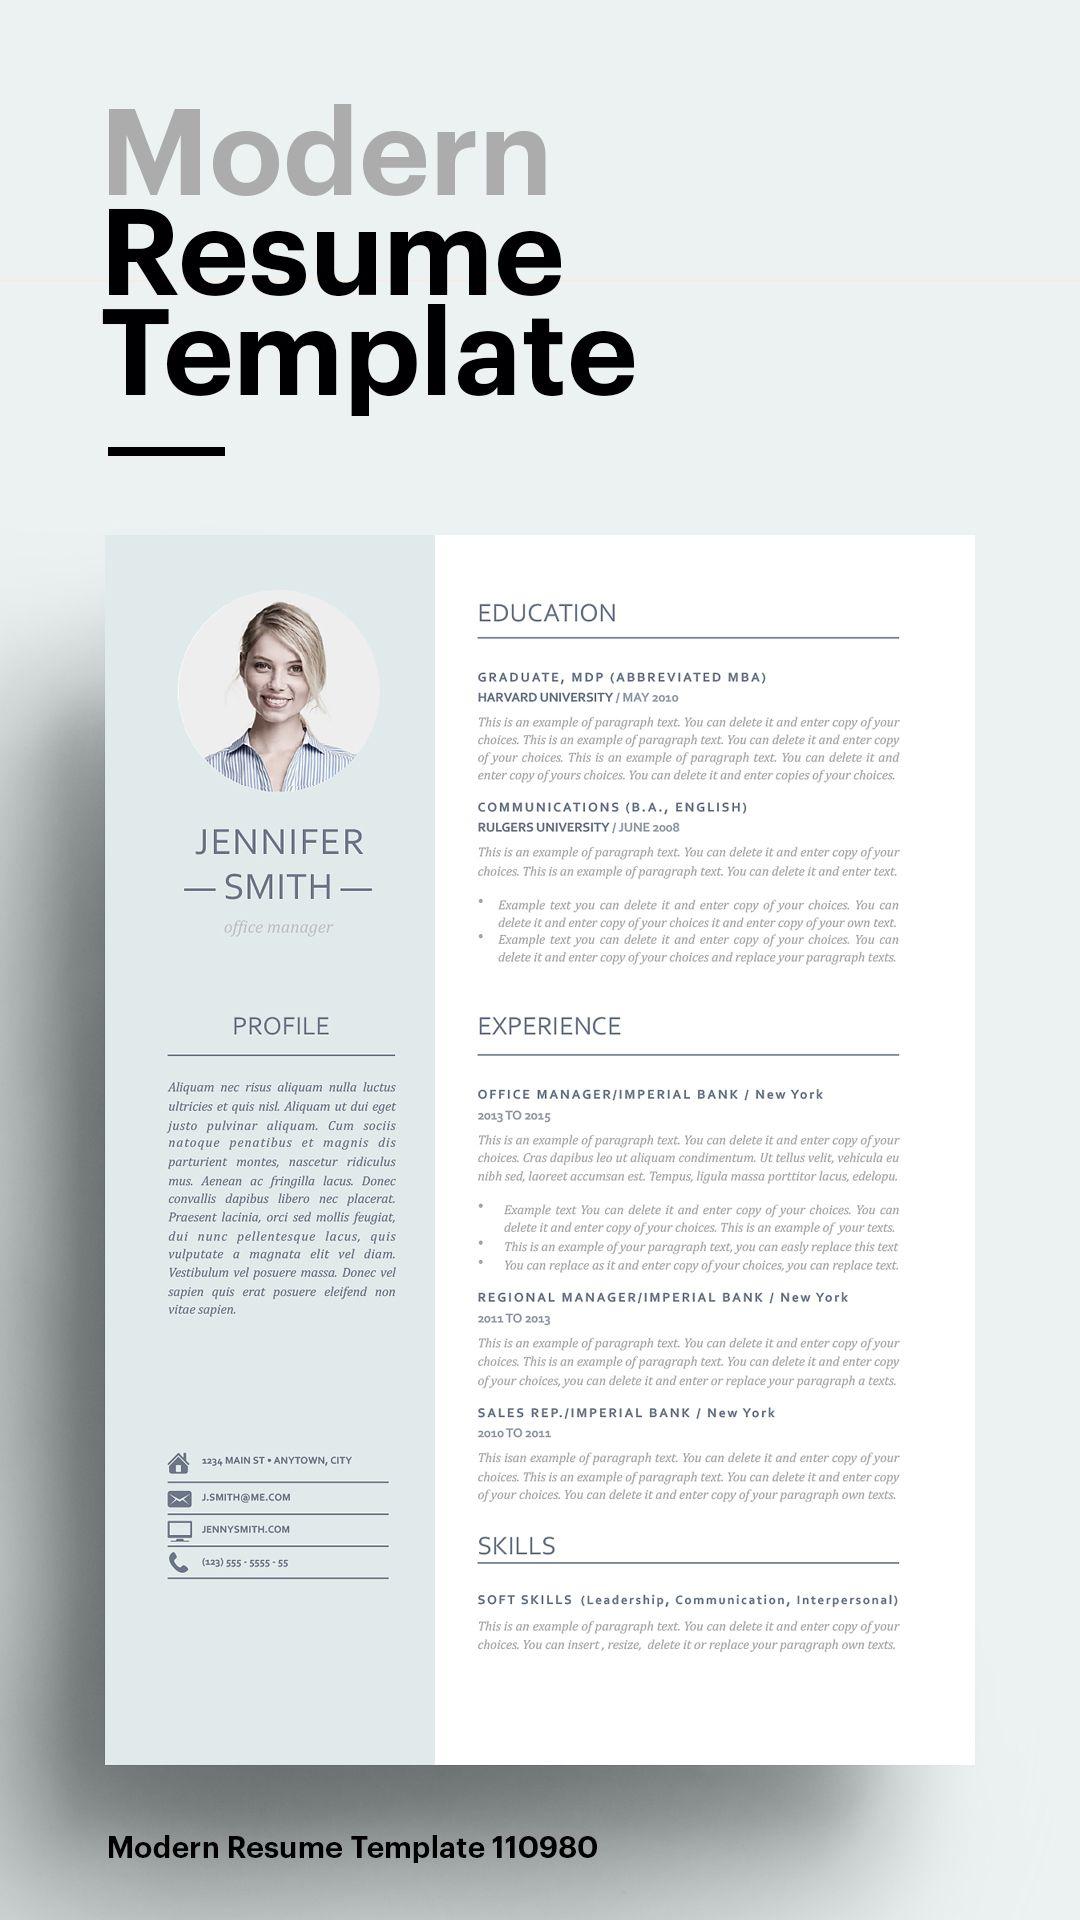 Modern Resume Template 110980 Resume template word